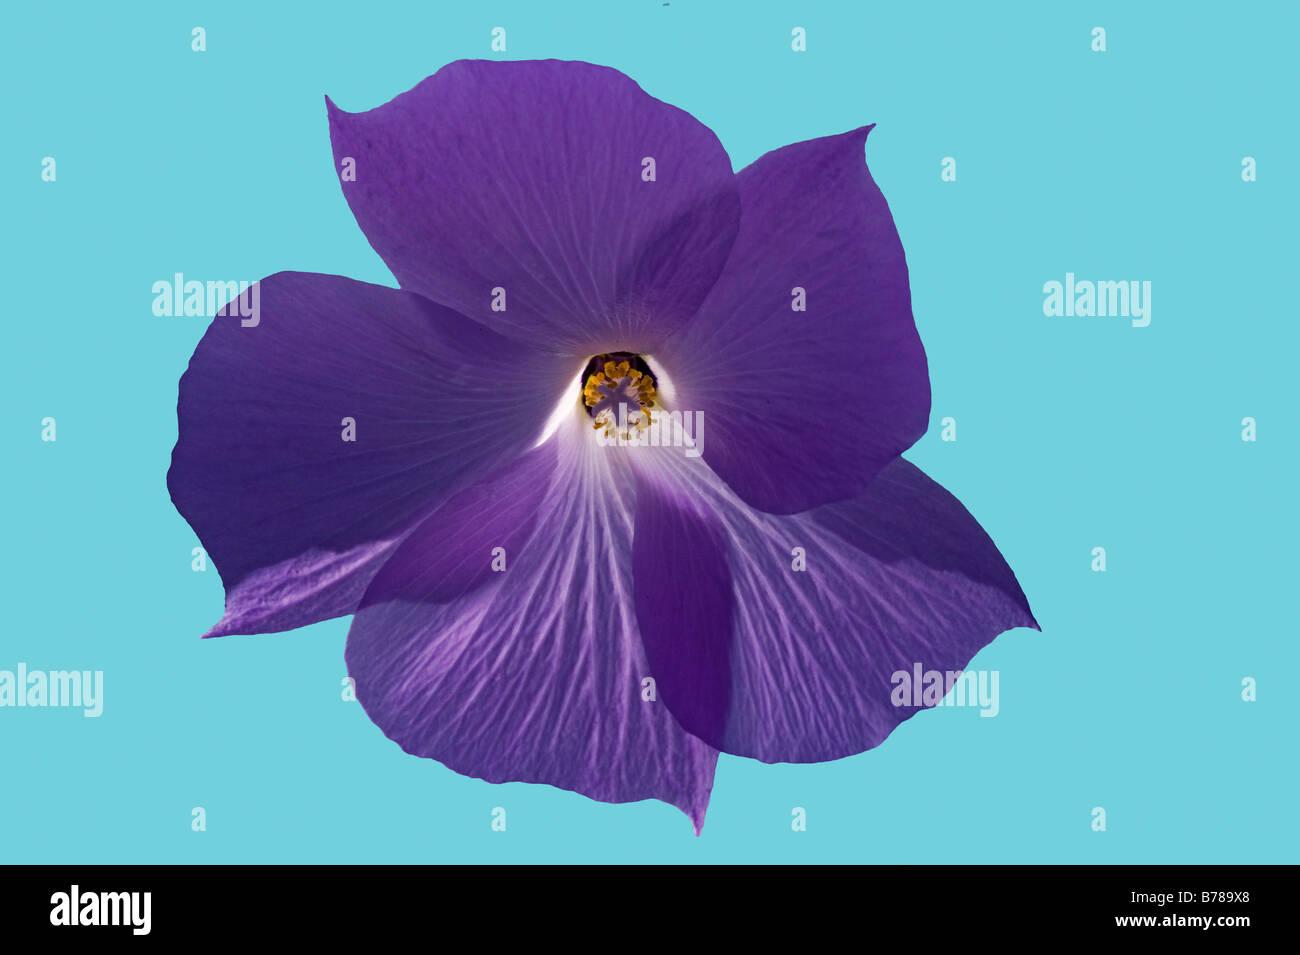 simple image of purple morning glory flower petals - Stock Image